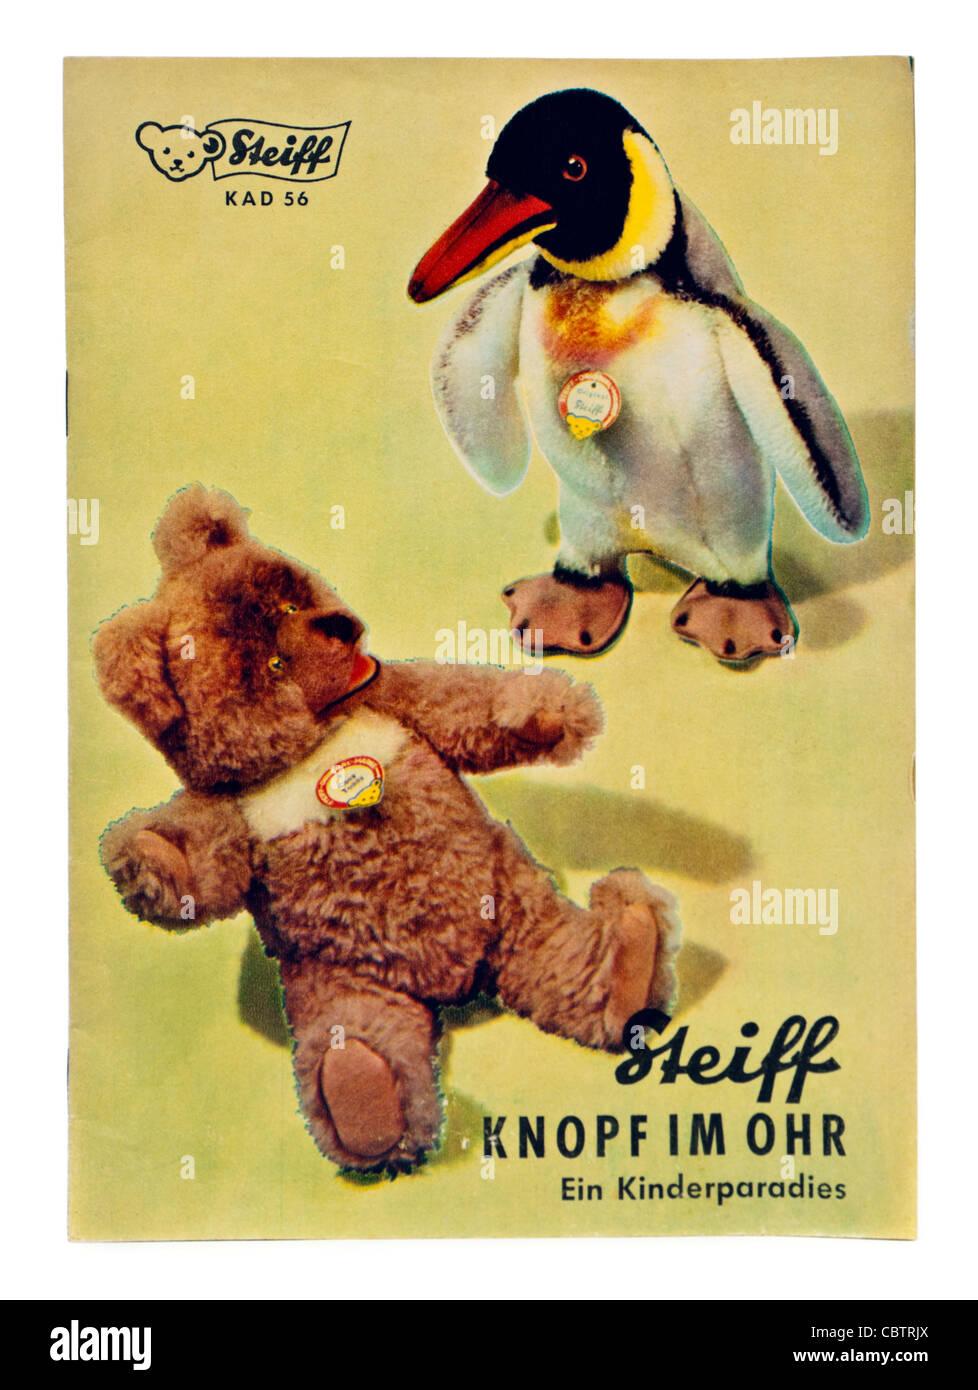 Vintage original 1956 Steiff catalogue - Stock Image